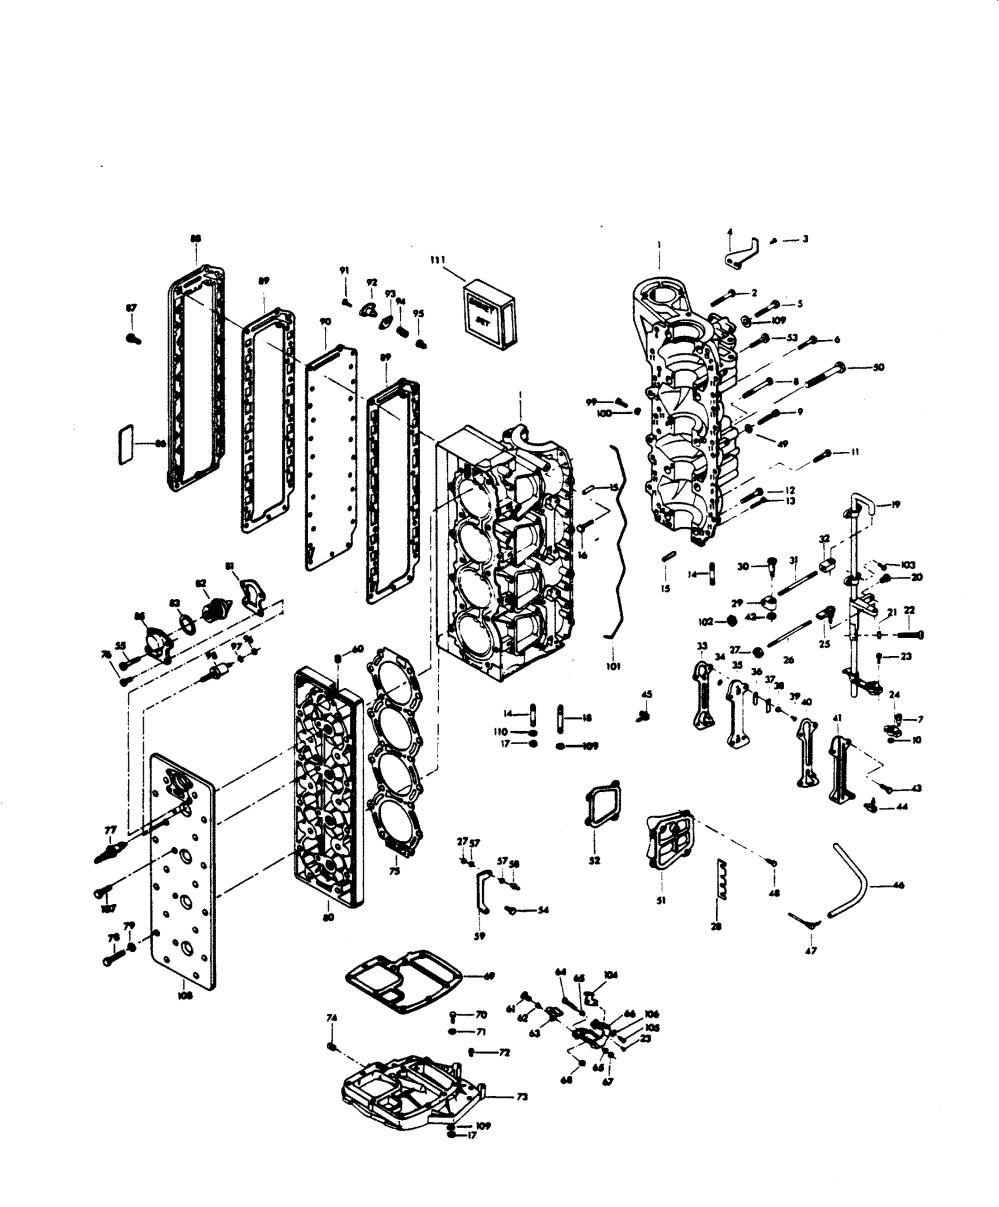 medium resolution of 1979 115 chrysler wiring diagram wiring library chrysler wiring diagrams symbols identify mercury chrysler 115